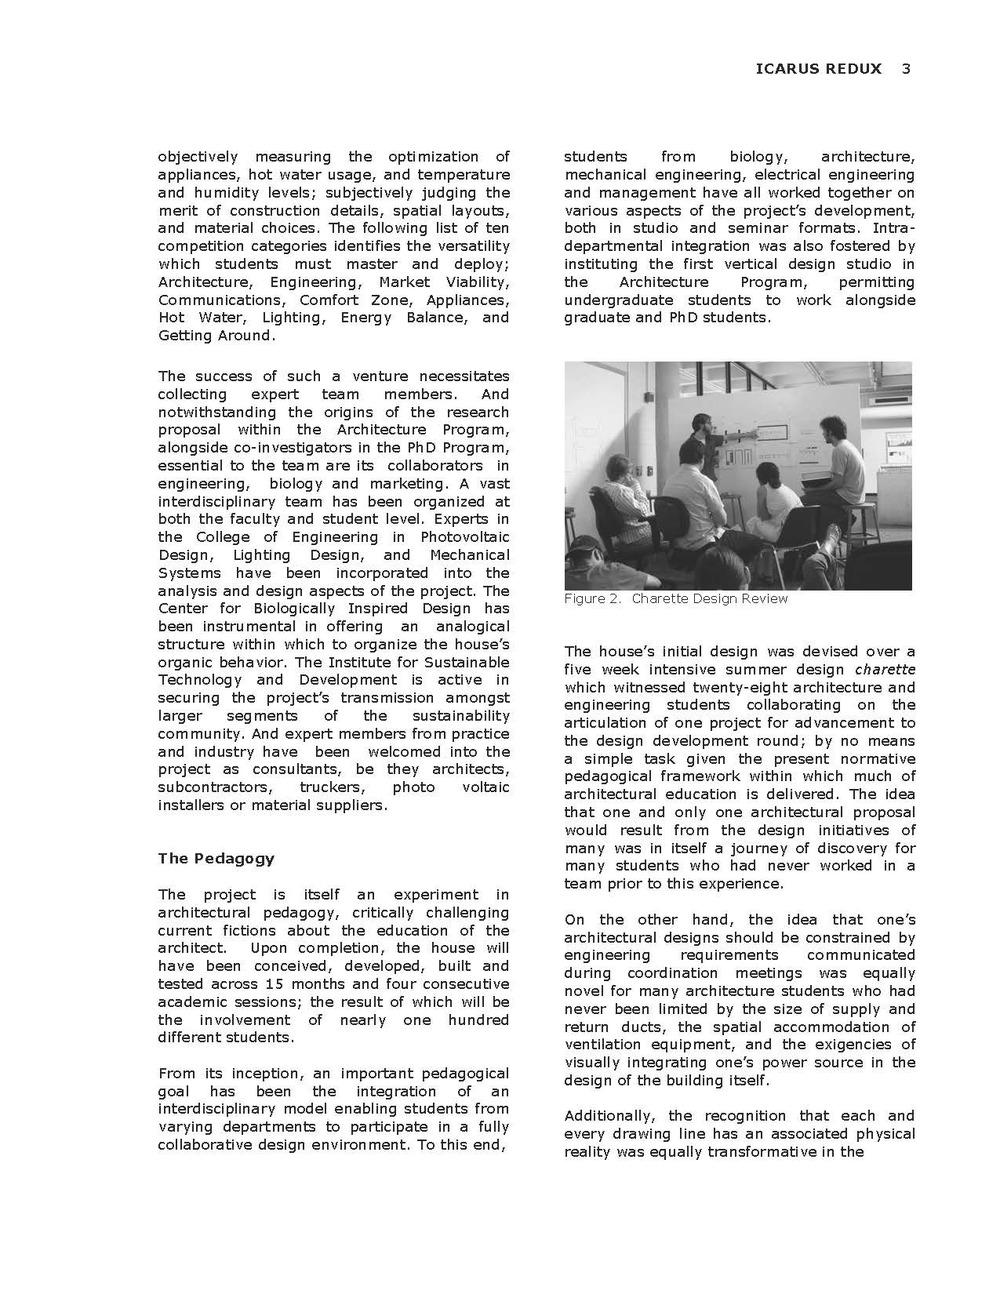 ACSA.2007.IcarusRedux2_Page_3.jpg